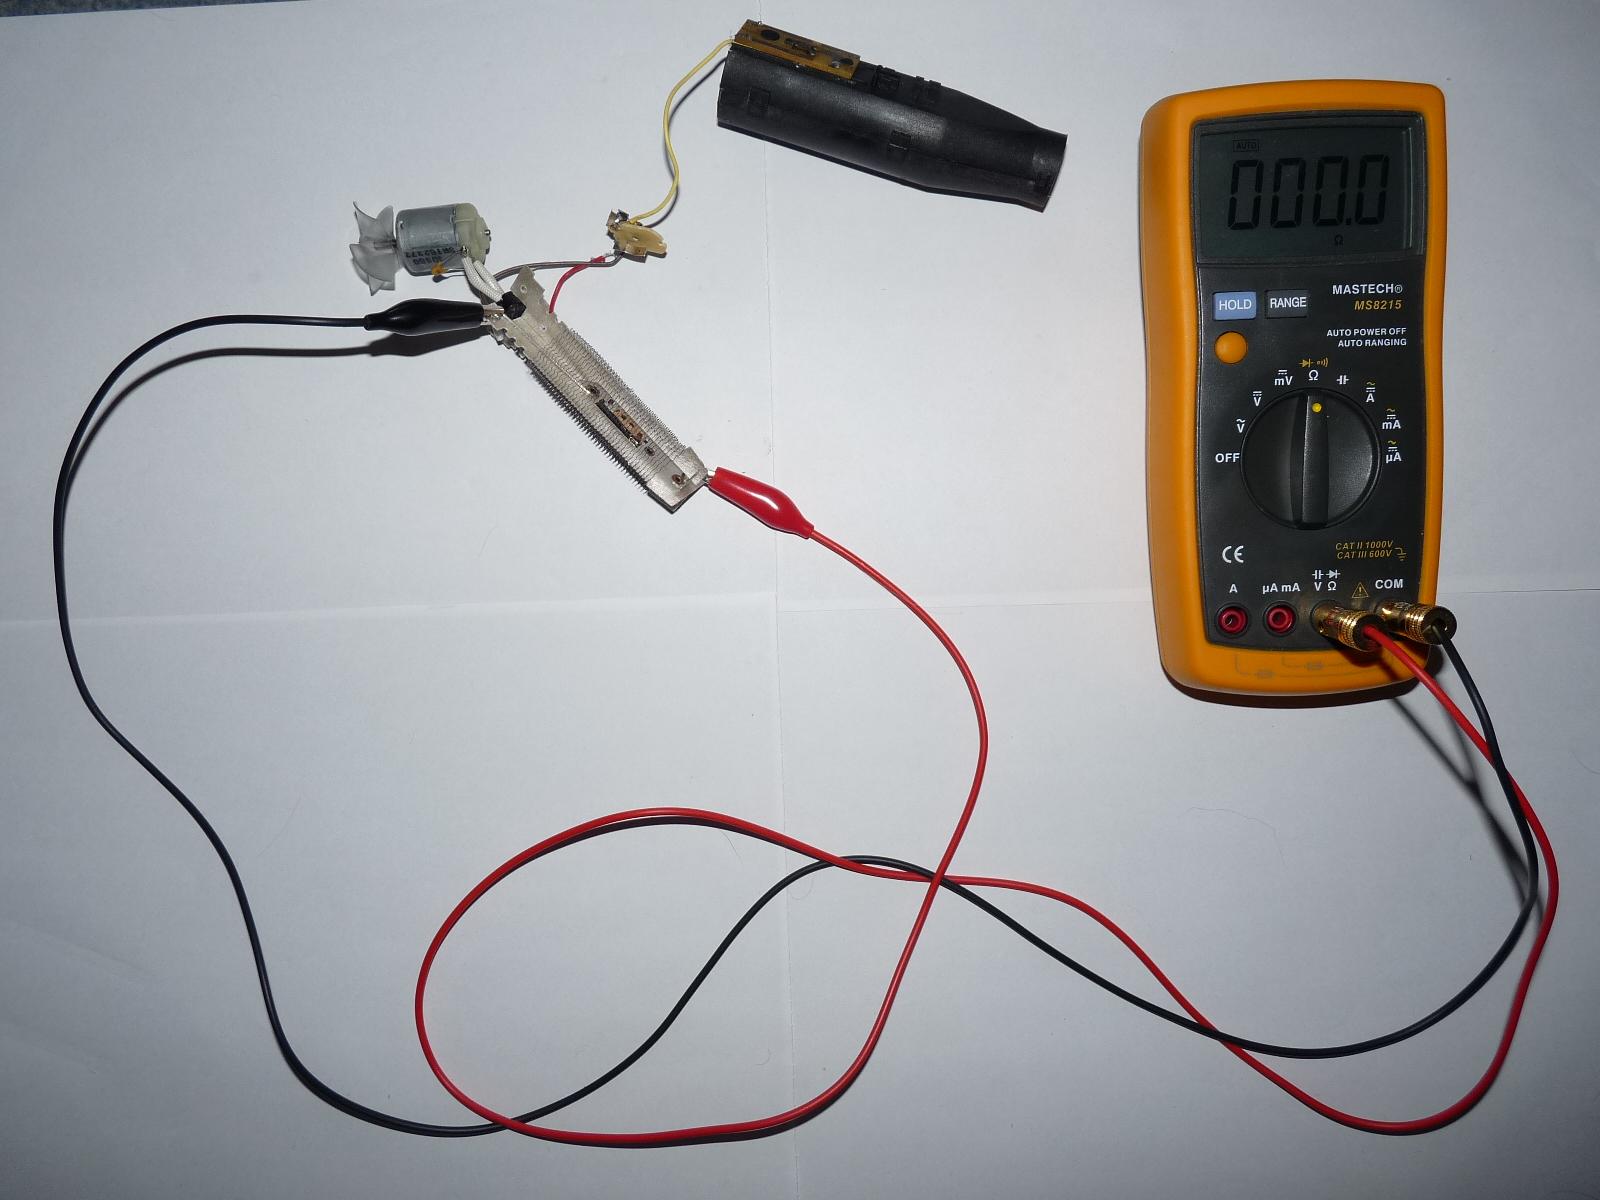 File:Bimetallic strip checking.JPG - Wikimedia Commons